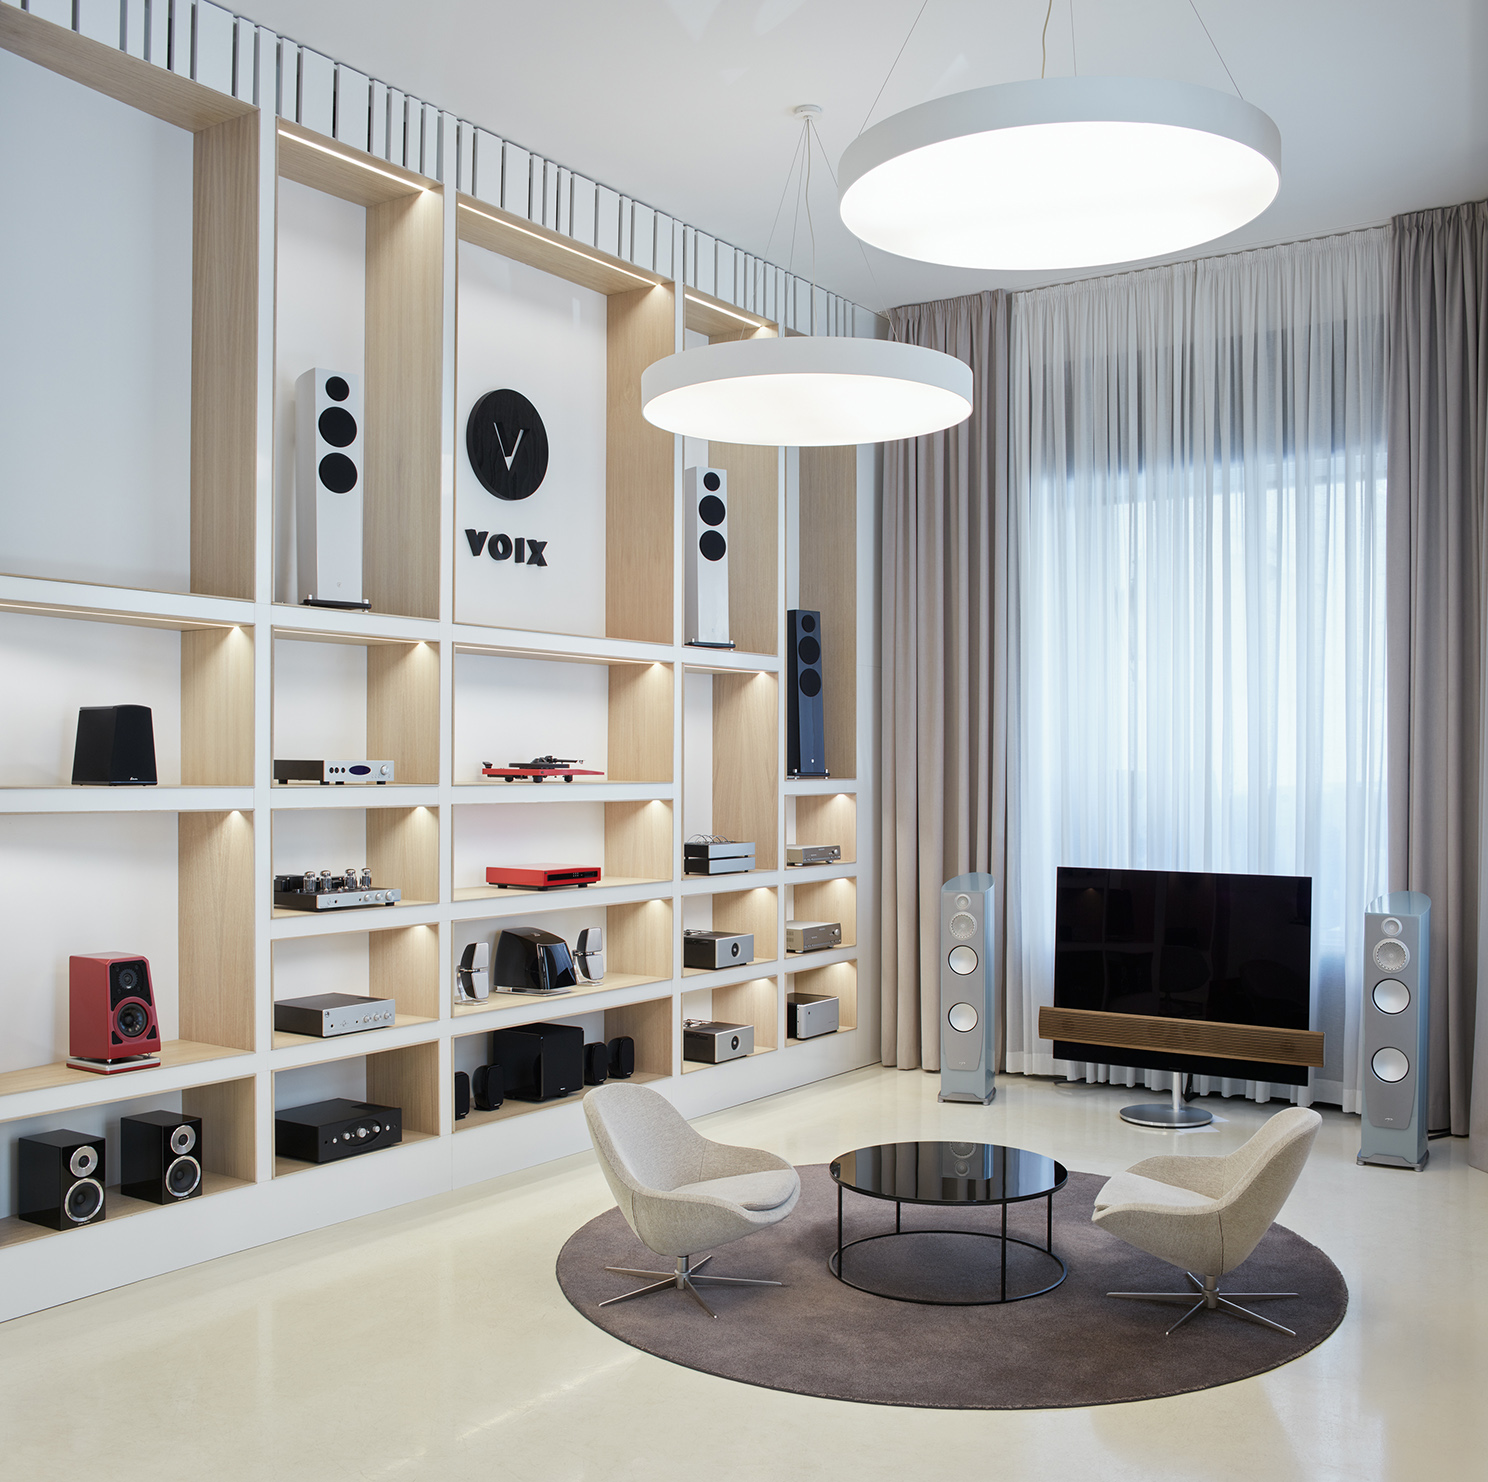 VOIX_BoysPlayNice_01_Barbora_Leblova_Interiors_Architecture